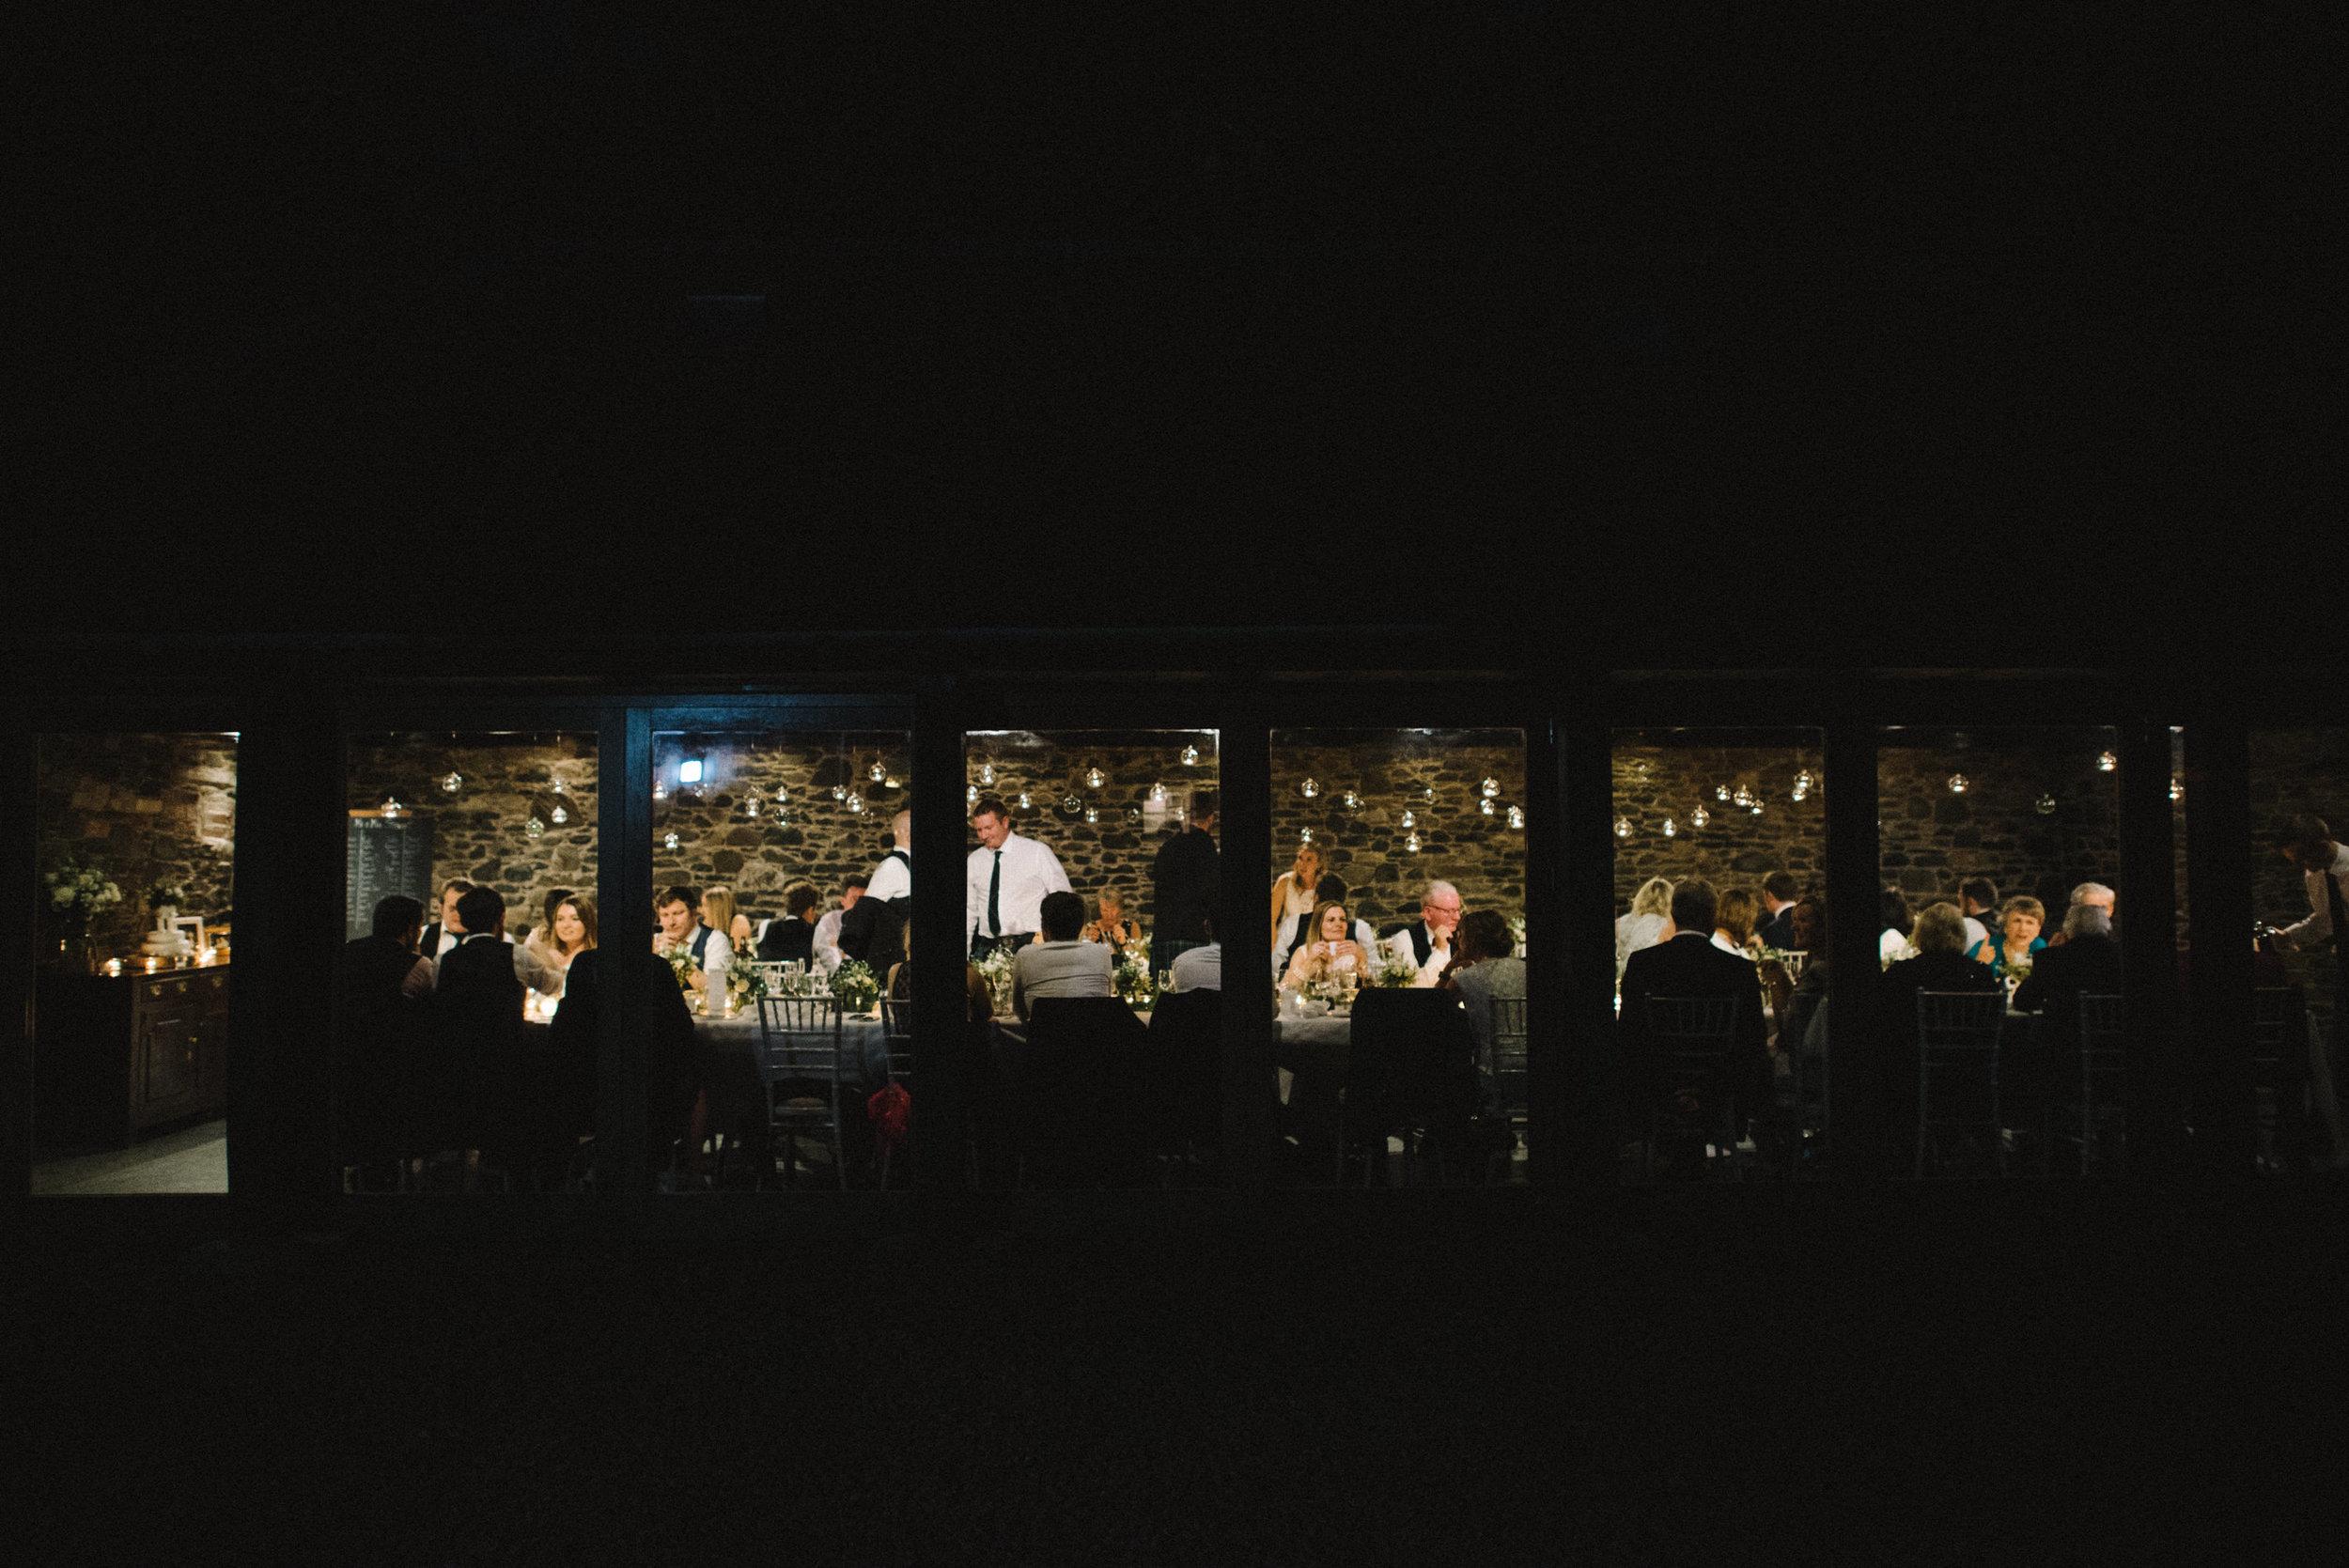 0069-LISA-DEVINE-PHOTOGRAPHY-ALTERNATIVE-WEDDING-PHOTOGRAPHY-SCOTLAND-DESTINATION-WEDDINGS-GLASGOW-WEDDINGS-COOL-WEDDINGS-STYLISH-WEDDINGS.JPG